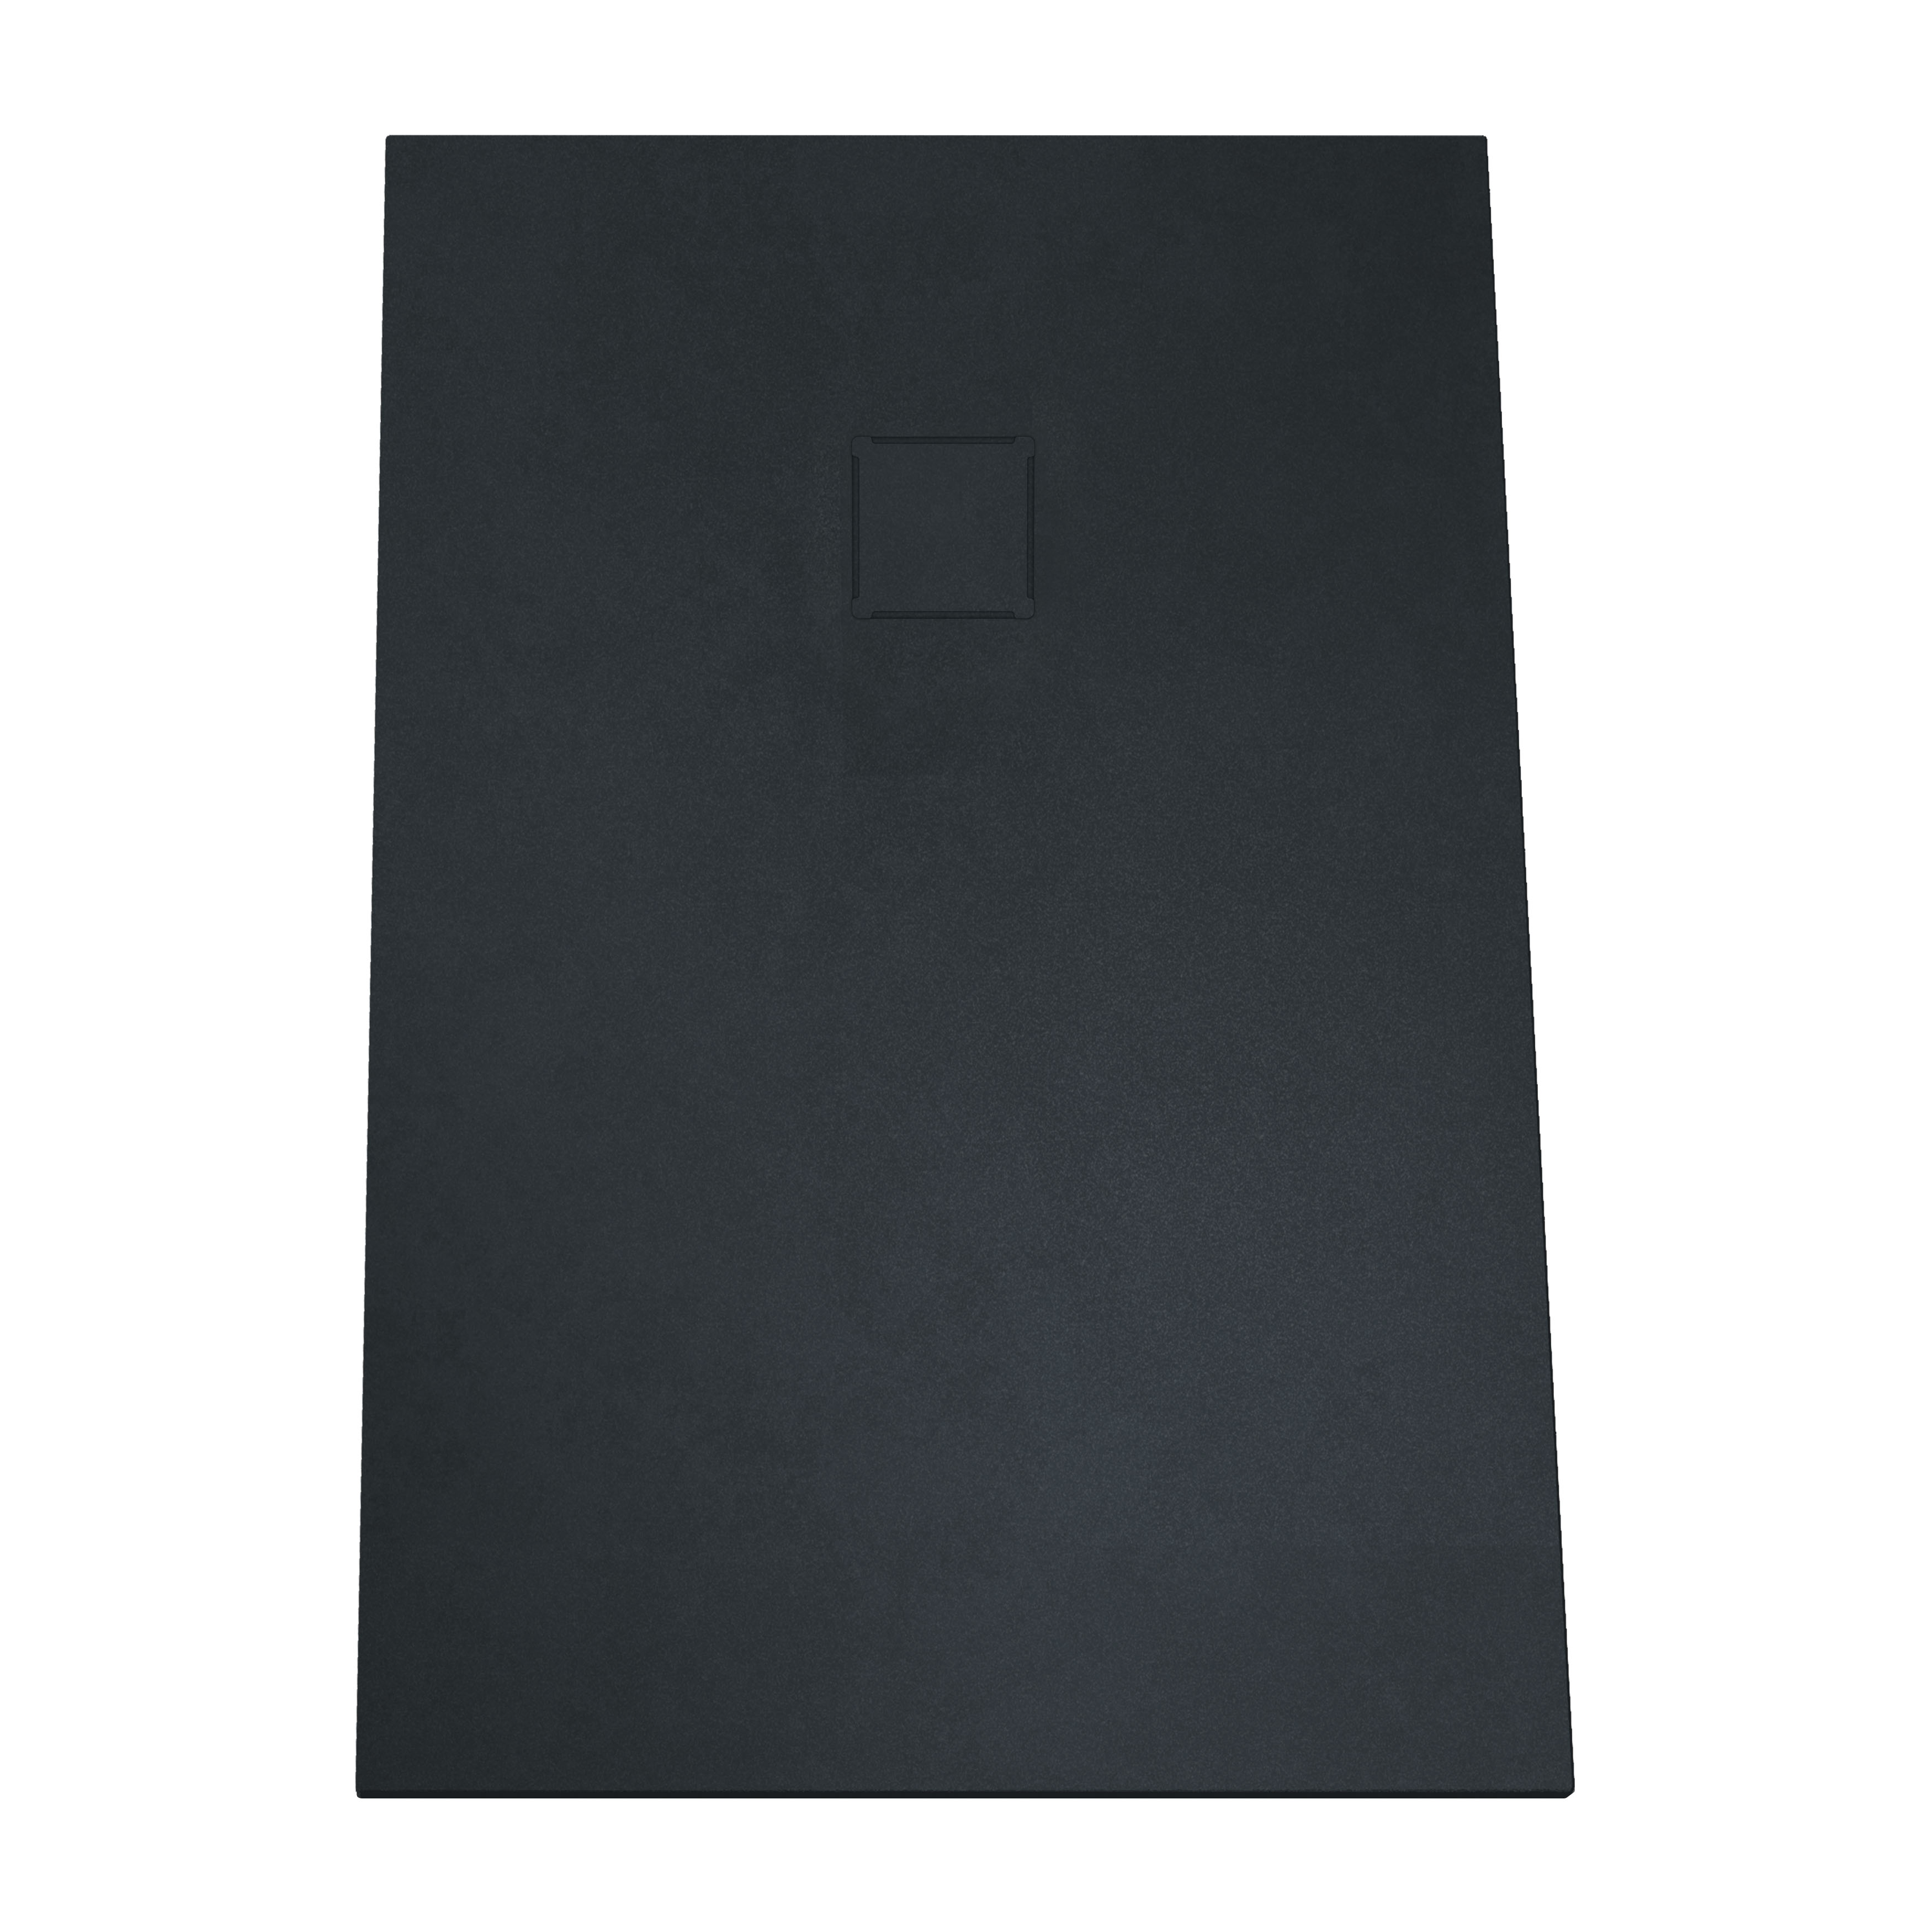 V-stone, receveur ultra plat en solid stone, 120  x  80 cm anthraciteacite